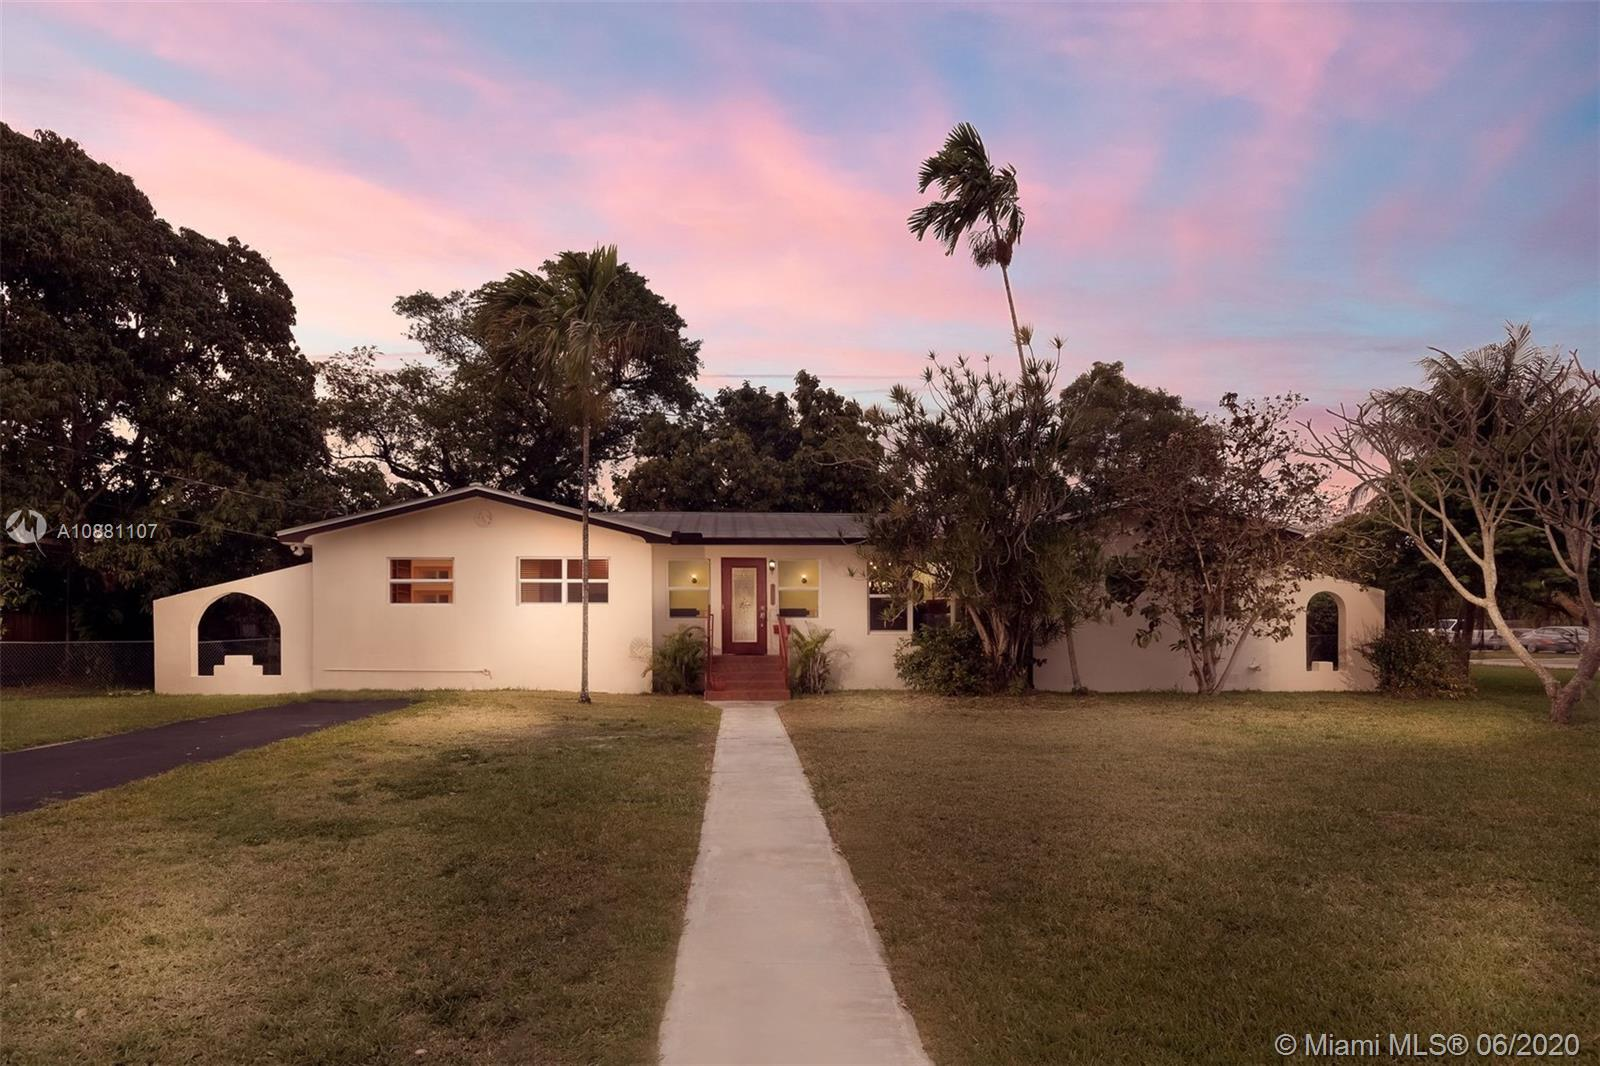 885 NE 111th St Property Photo - Biscayne Park, FL real estate listing